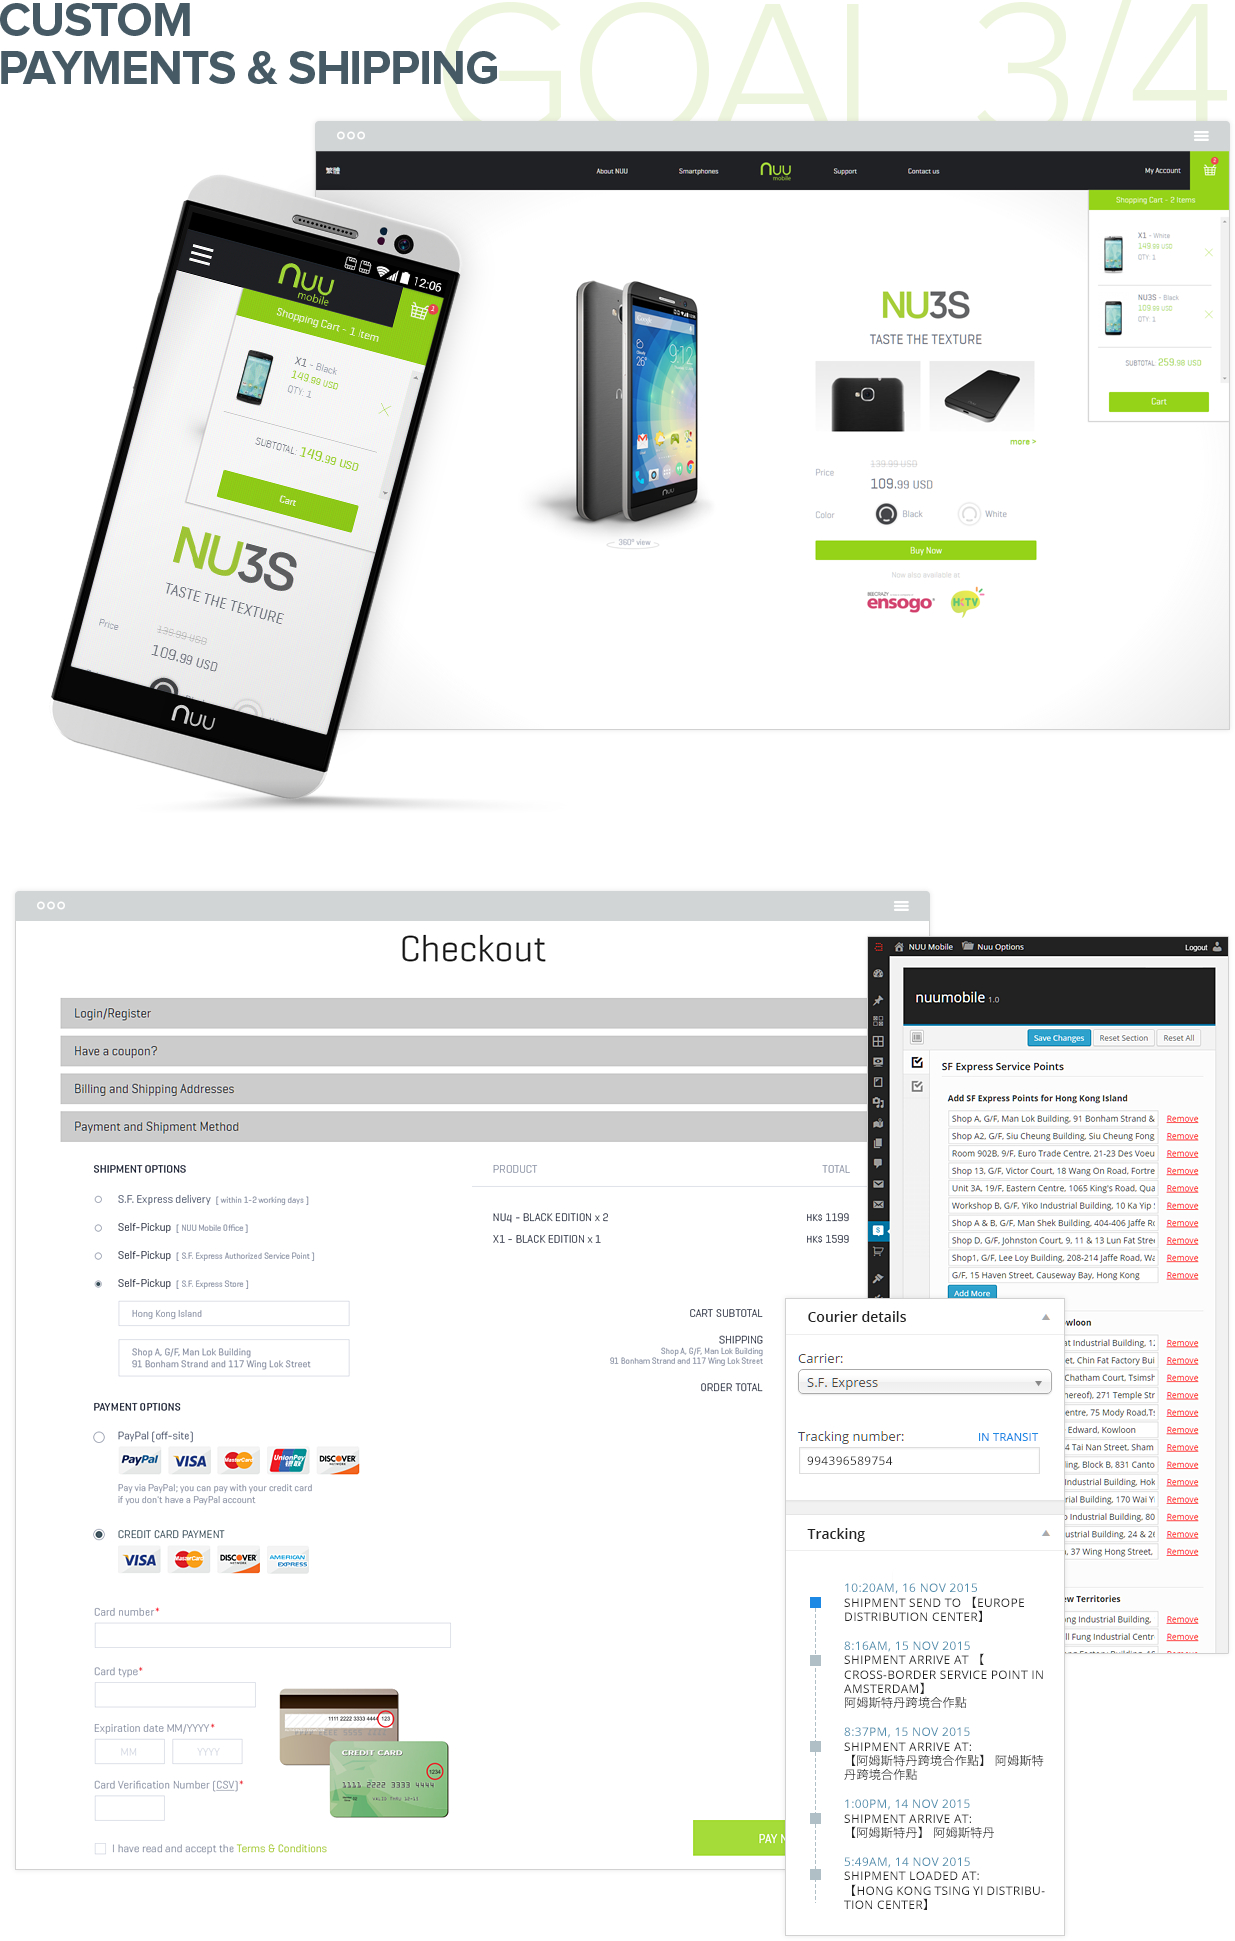 https://media.authentic-studio.com/web-content/uploads/2020/11/nuumobile-e-commerce-platform-design-and-development-example-4.jpg